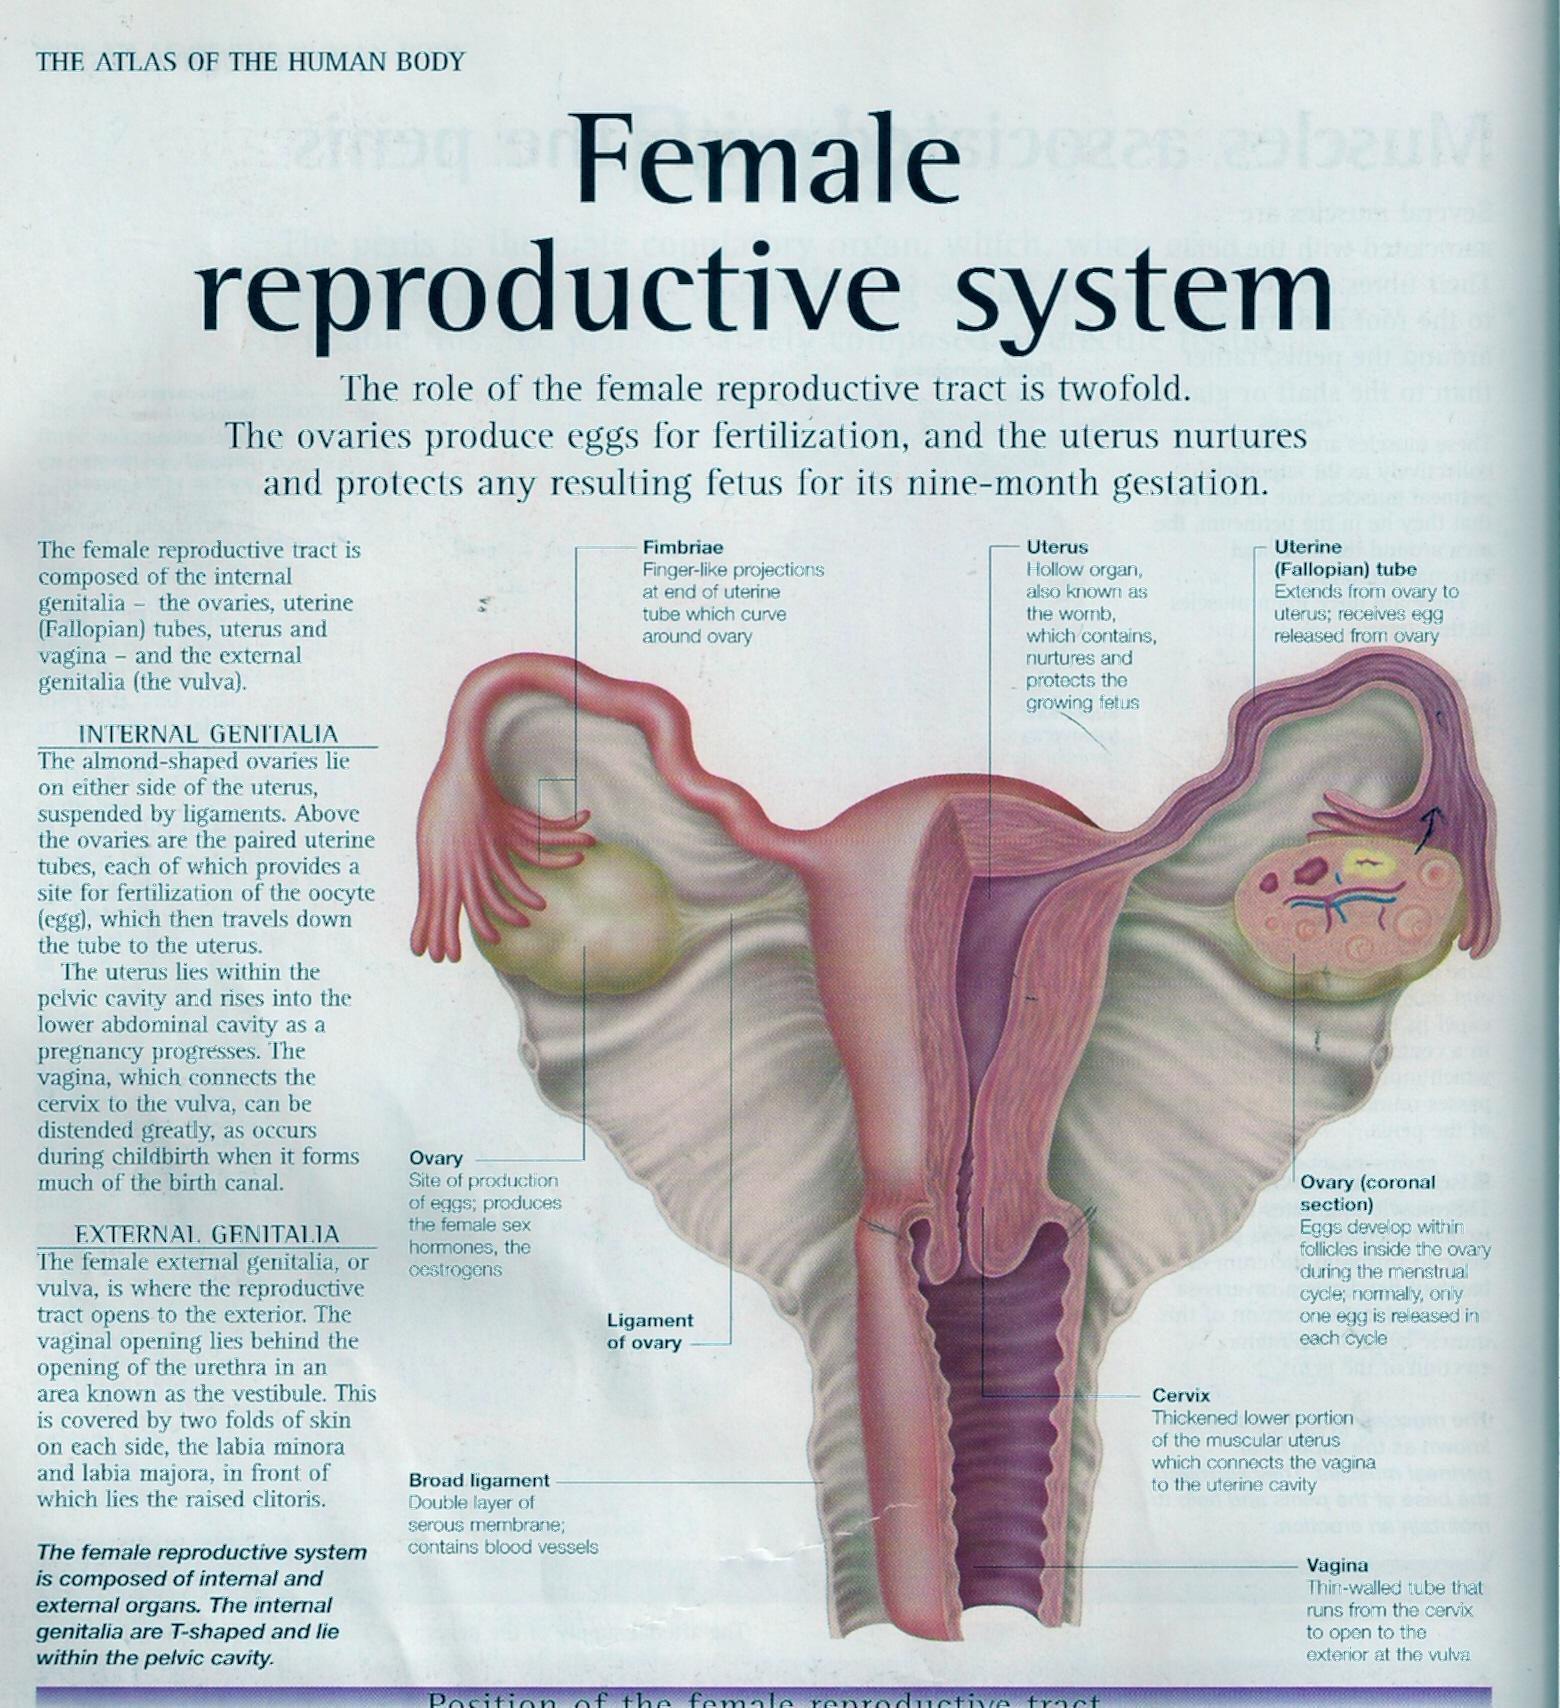 many ladies used to misunderstand the implantation bleeding with